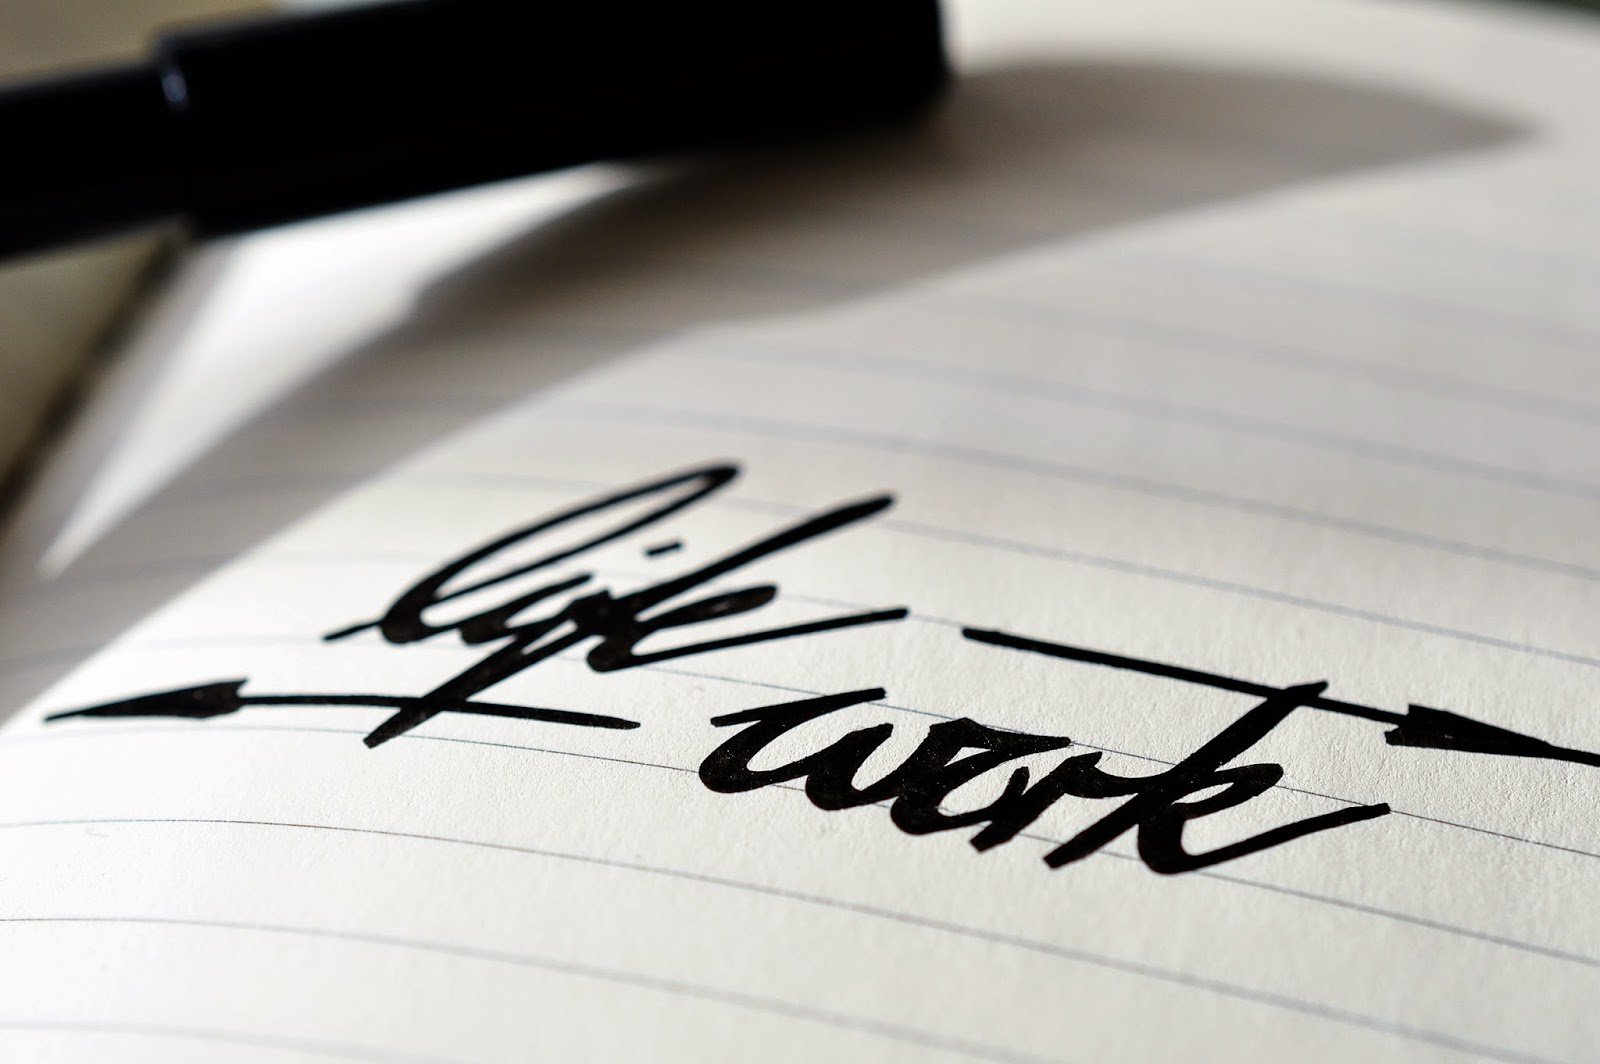 Work Life Balance | Motte's Blog